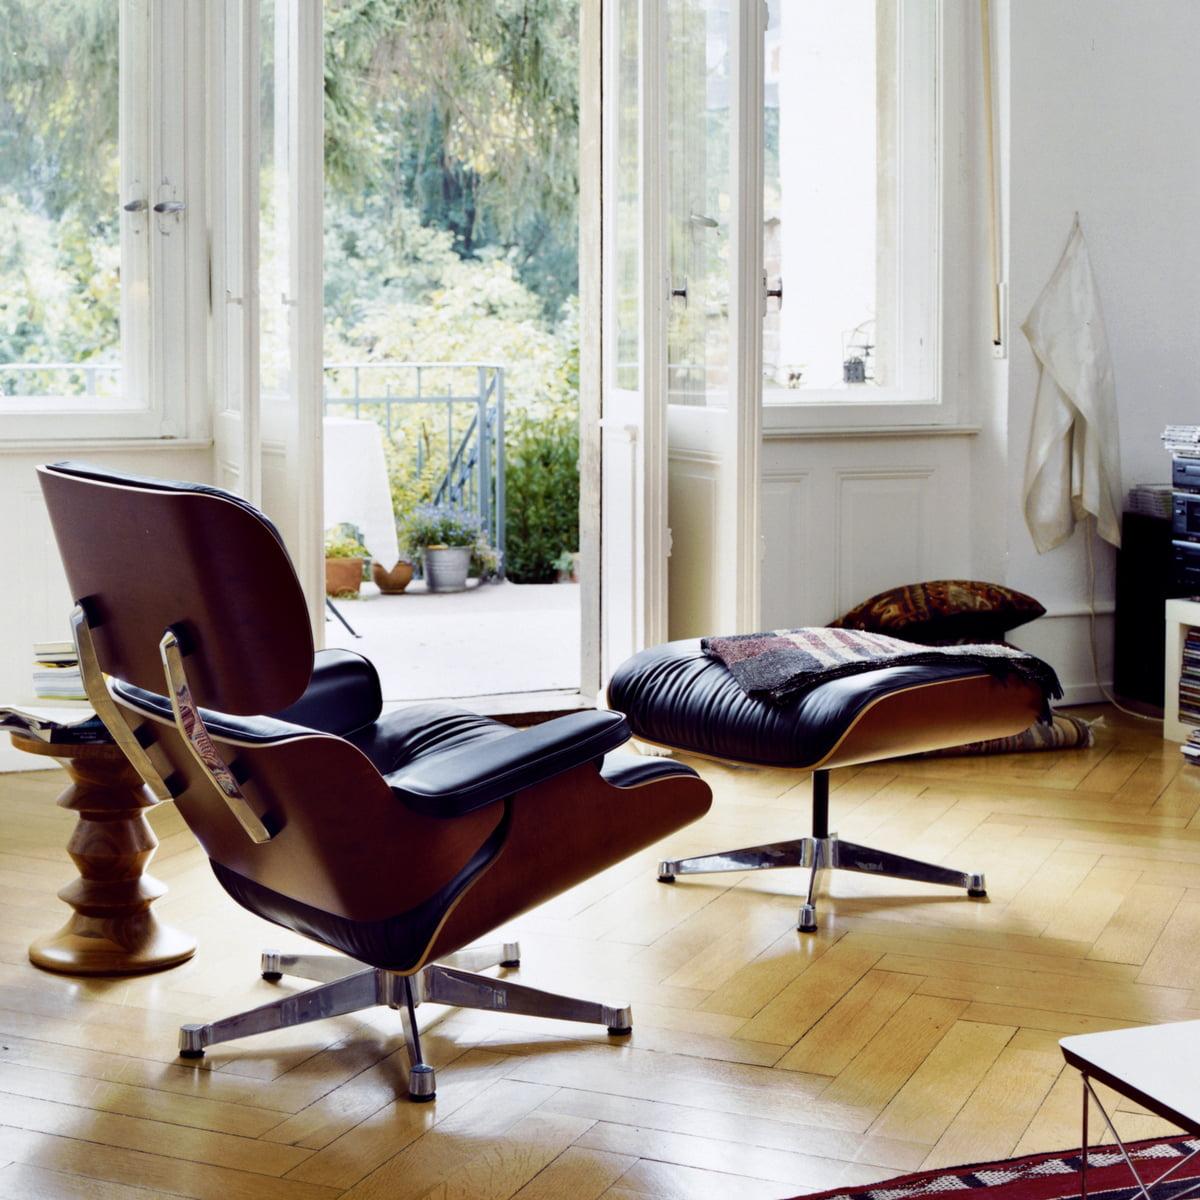 vitra lounge chair ottoman kirschbaum - Eames Lounge Stuhl Abmessungen